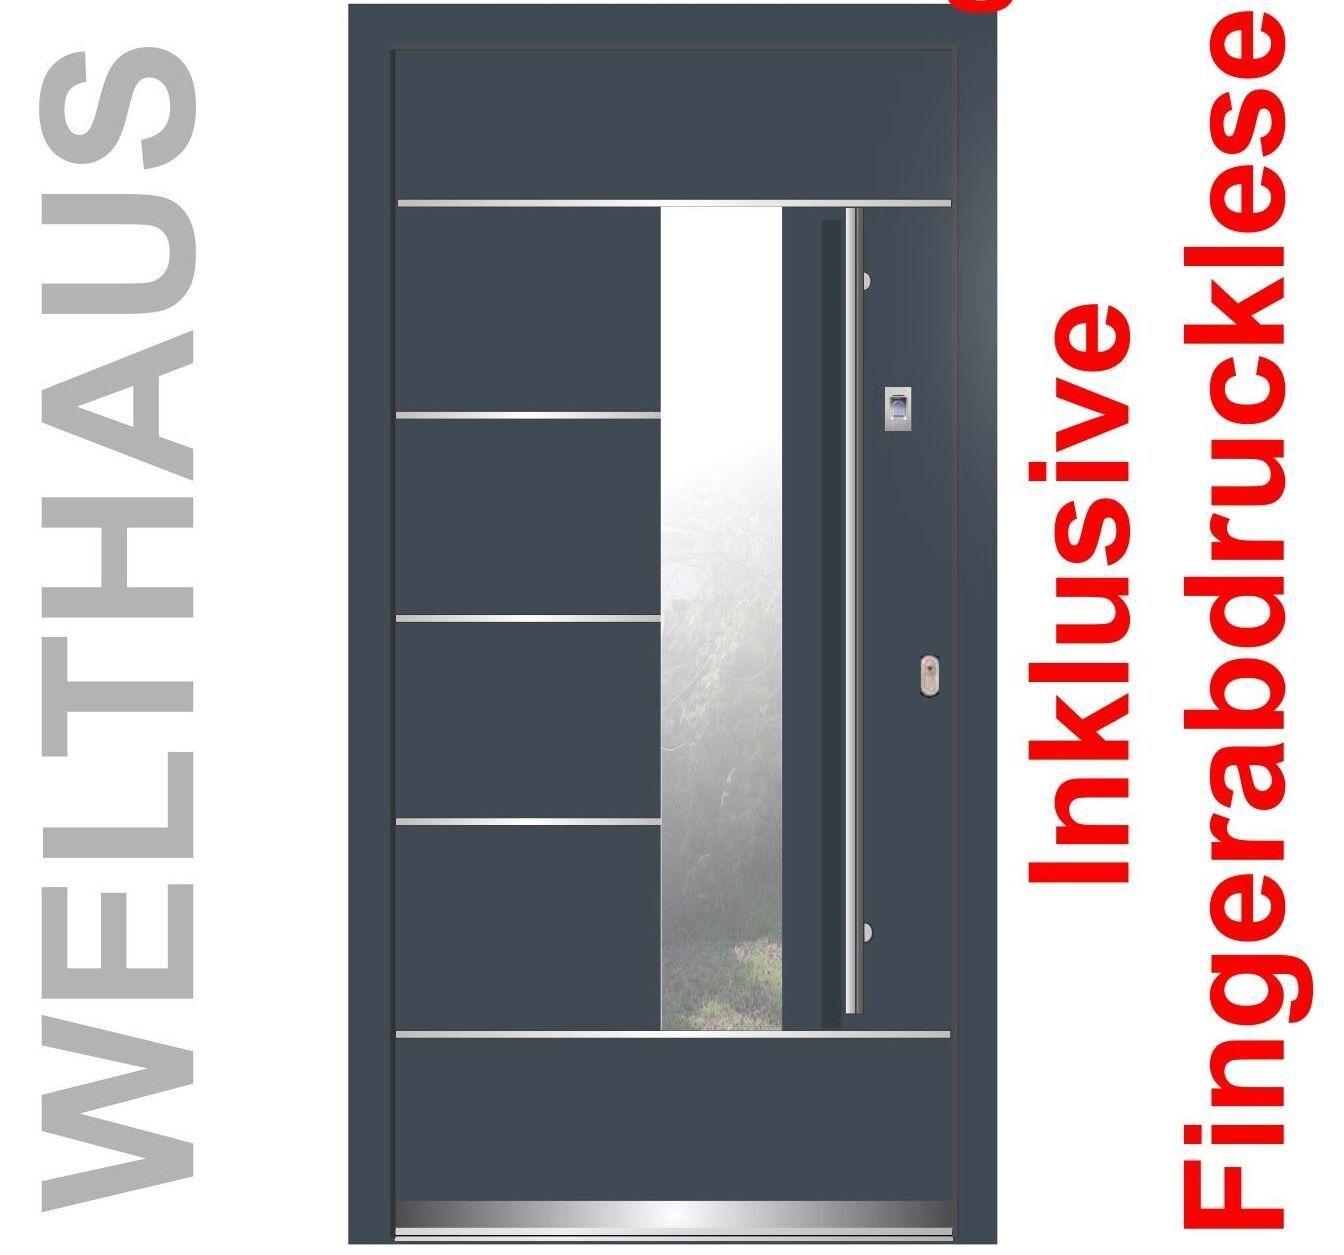 Haustür Welthaus Türen WH75 Aluminium Tür mit Kunststoff  LA40 Frankfurt Tür